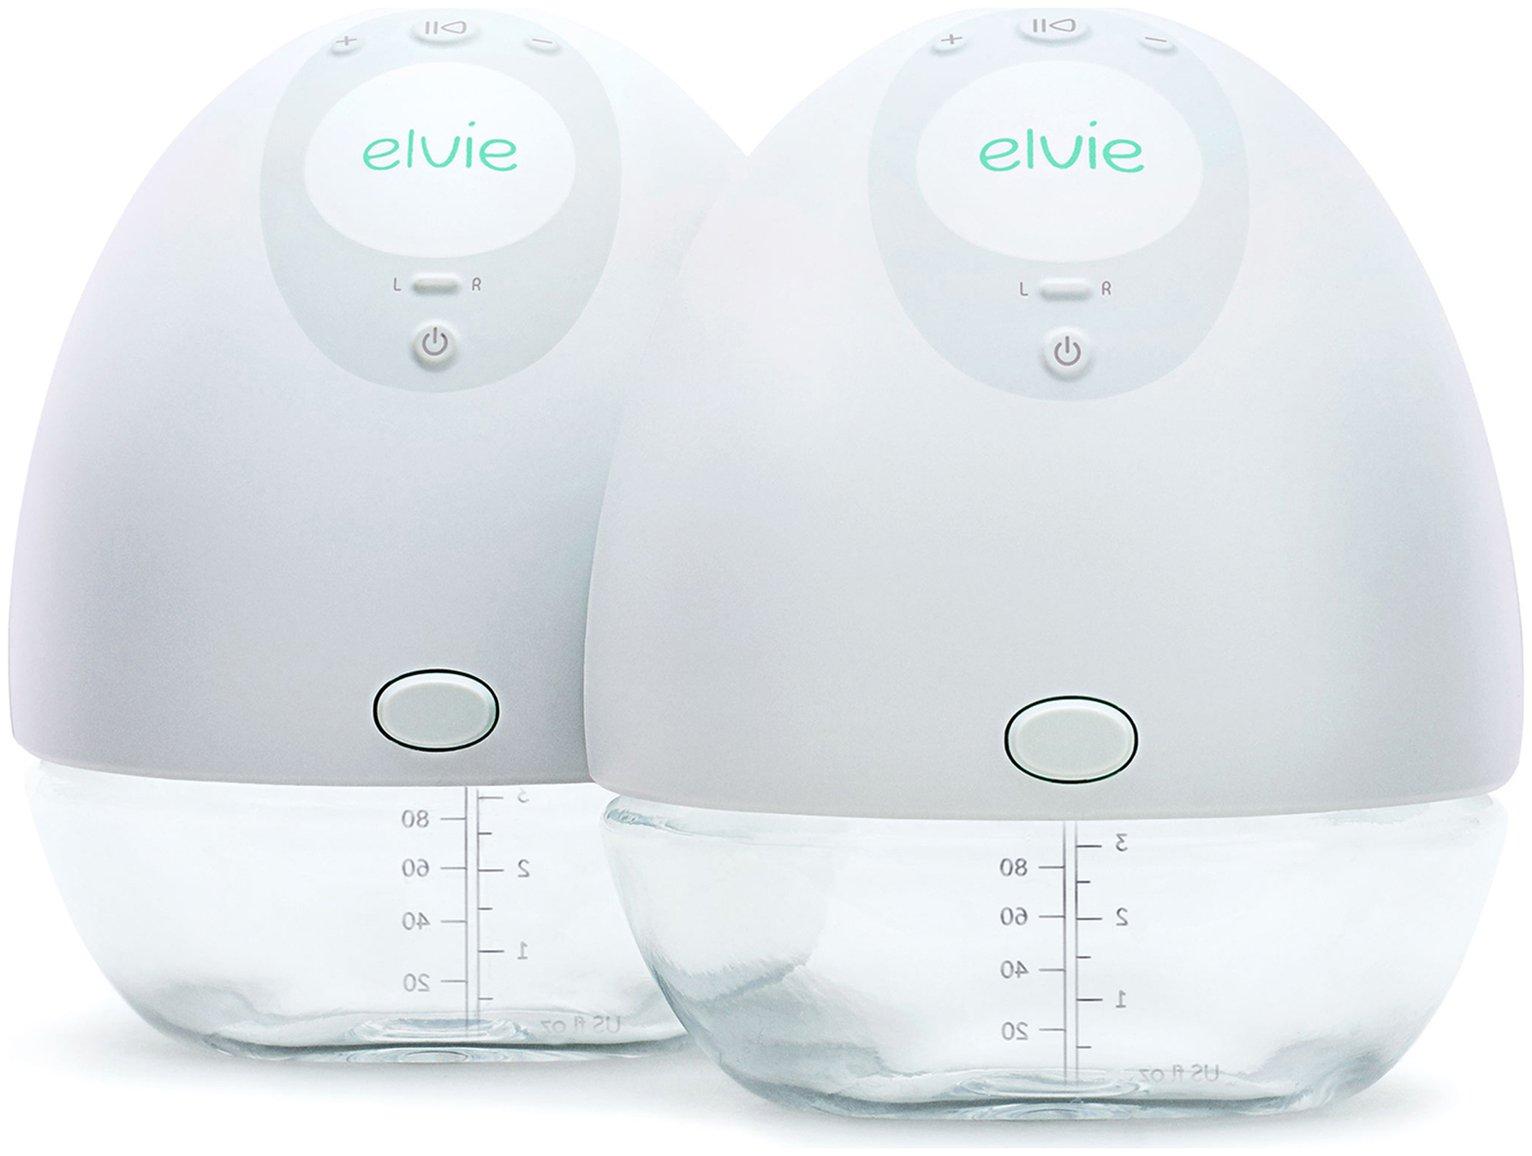 Elvie Pump - Double Electric Wearable Breast Pump